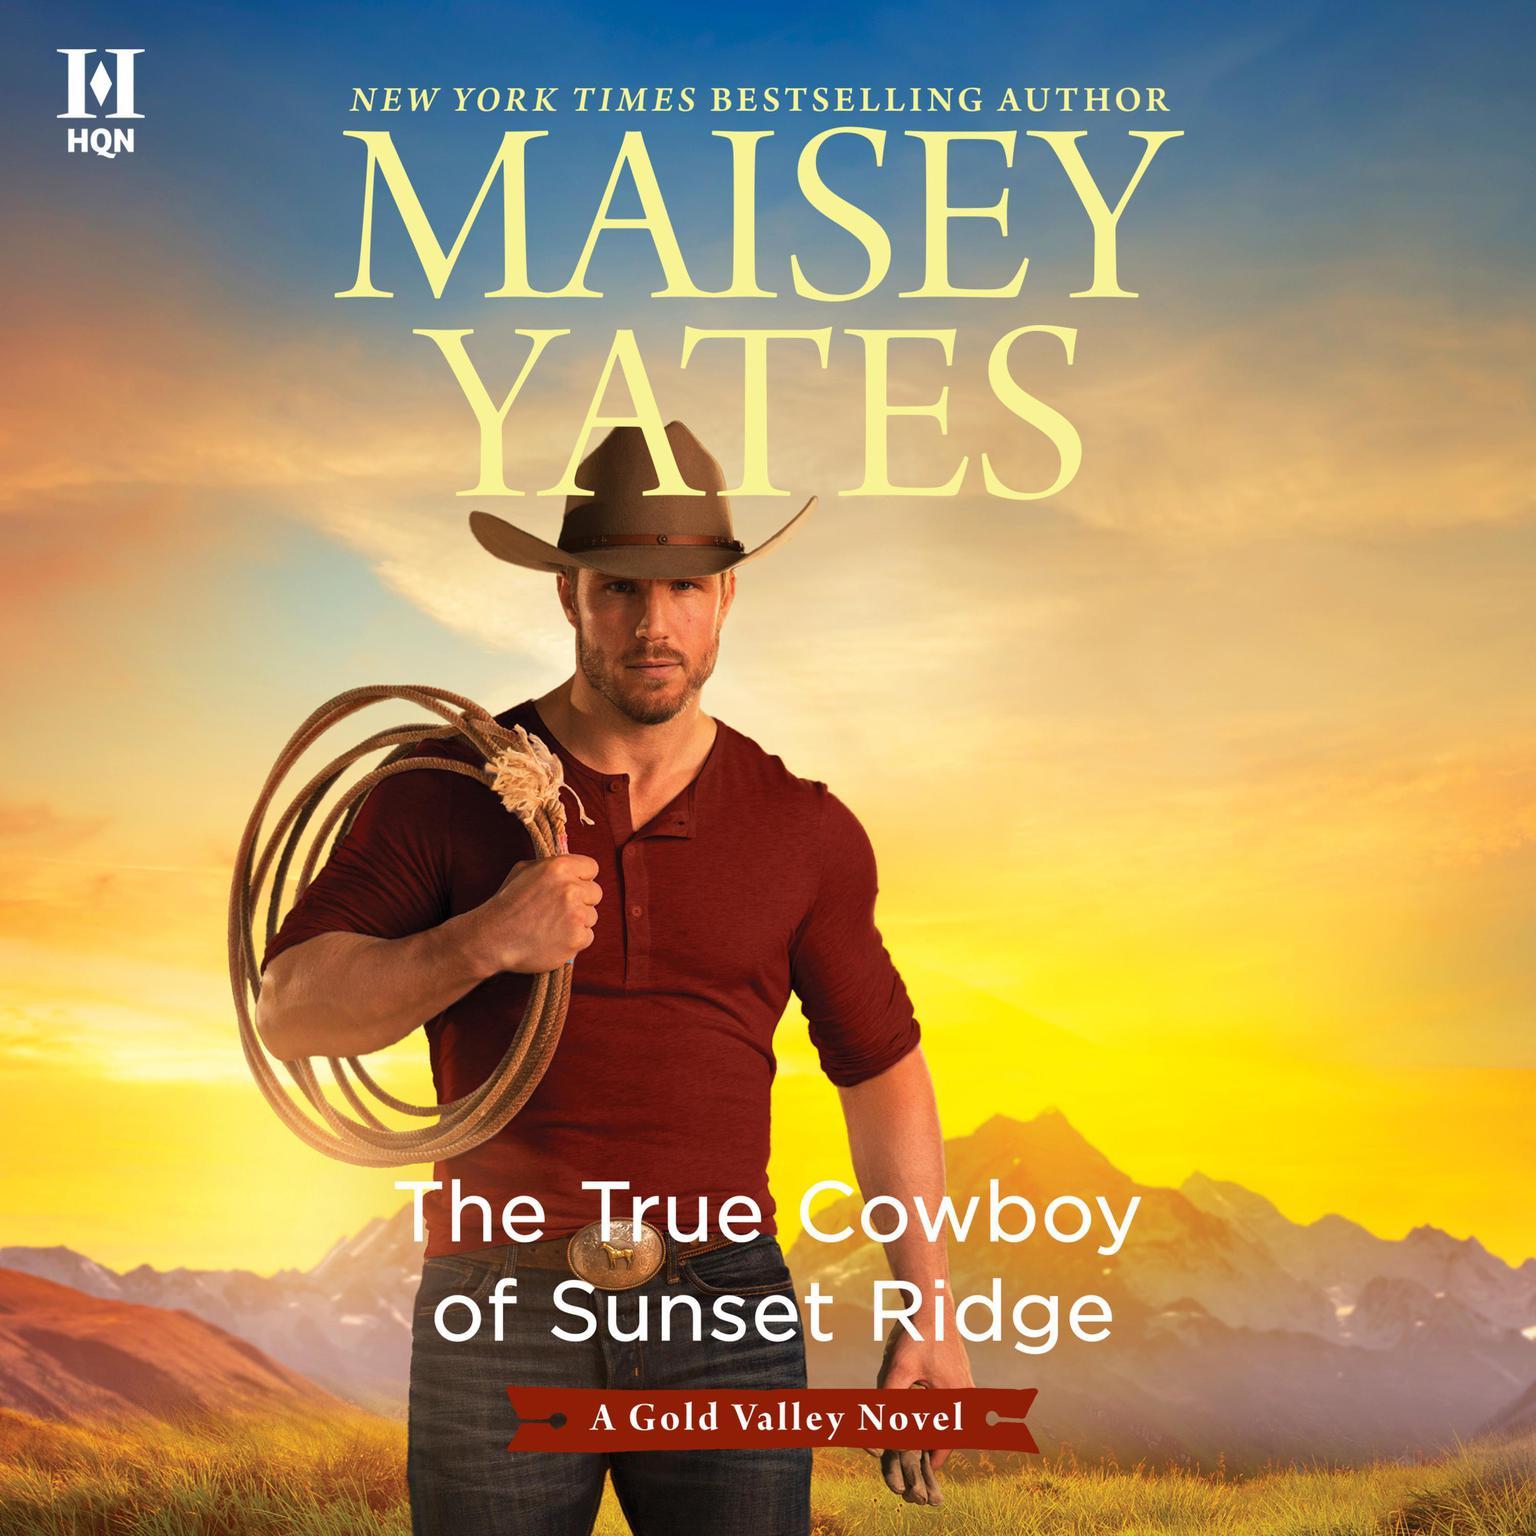 The True Cowboy of Sunset Ridge Audiobook, by Maisey Yates